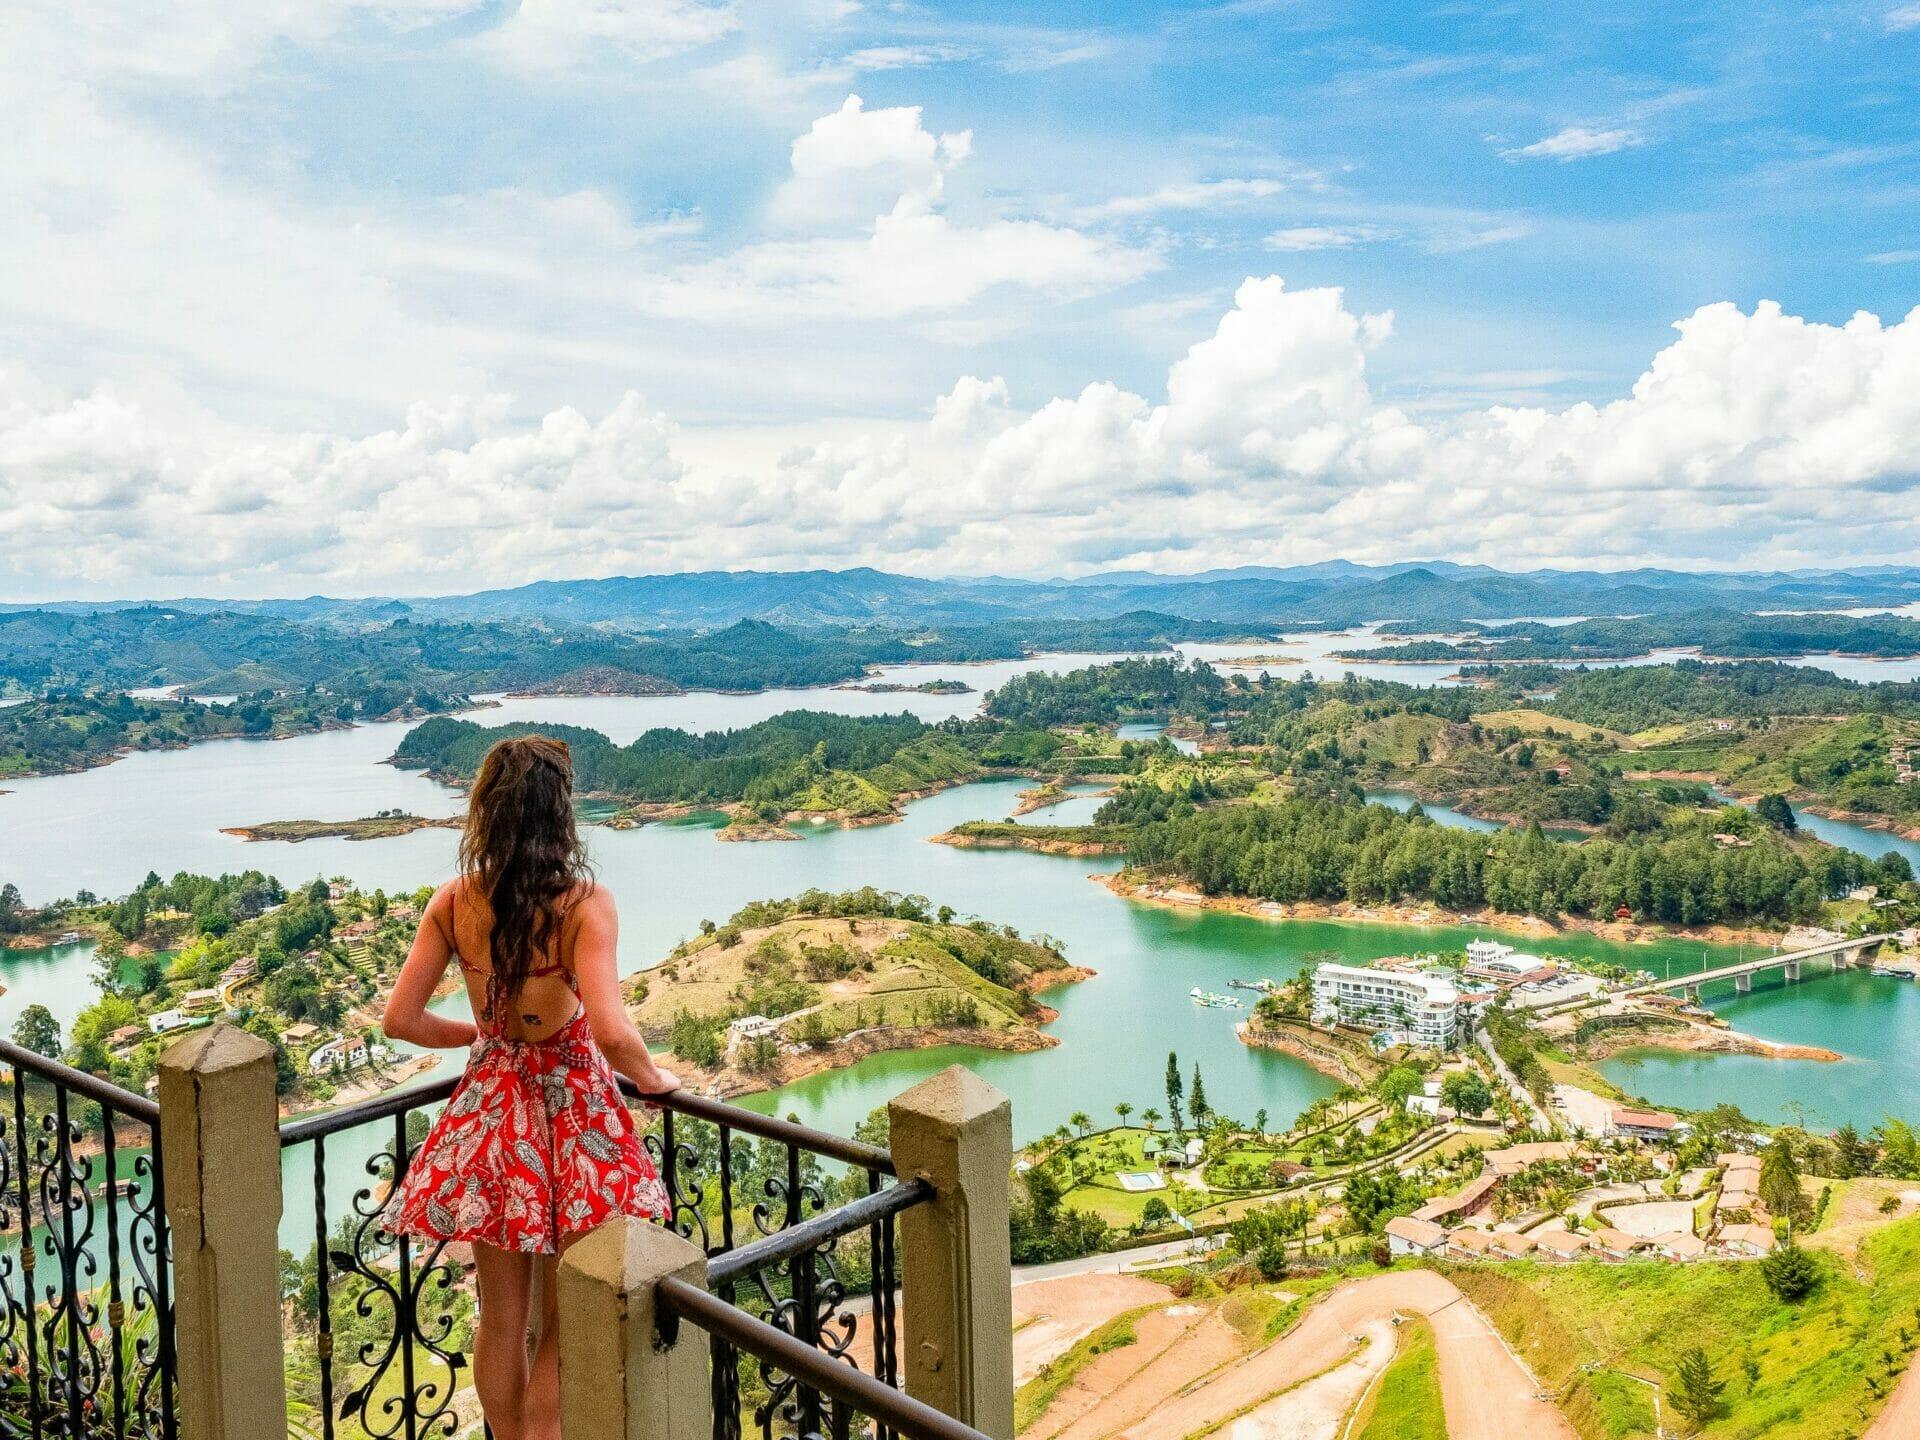 Girl climbing La Piedra overlooking lake Guatapé